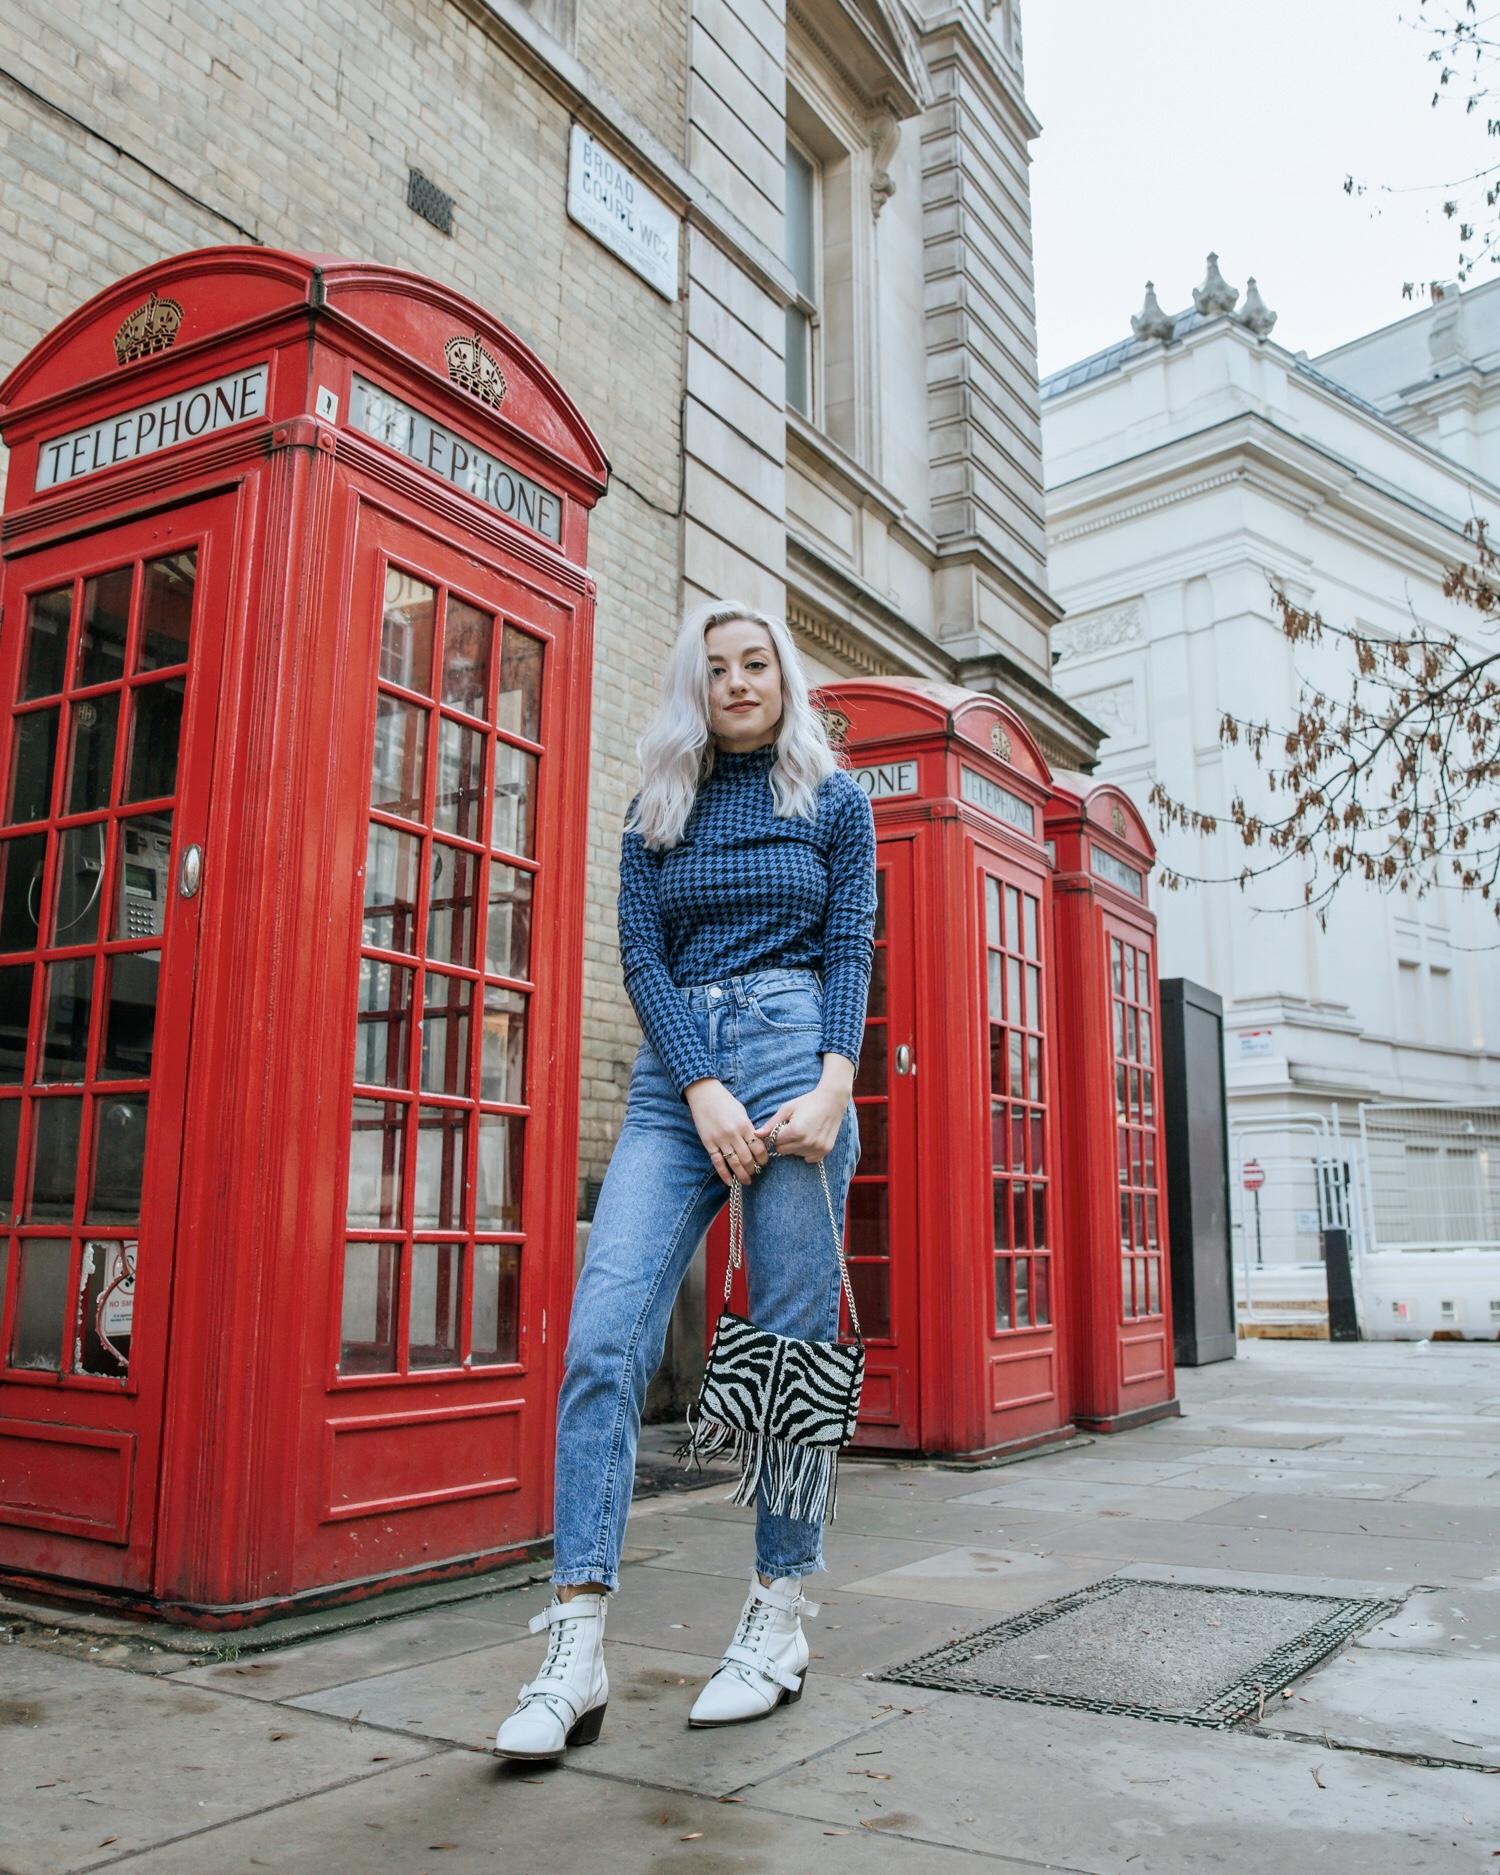 Outfit Details: Top: Monki, Jeans: Stradivarius, Boots: Office, Bag: Topshop